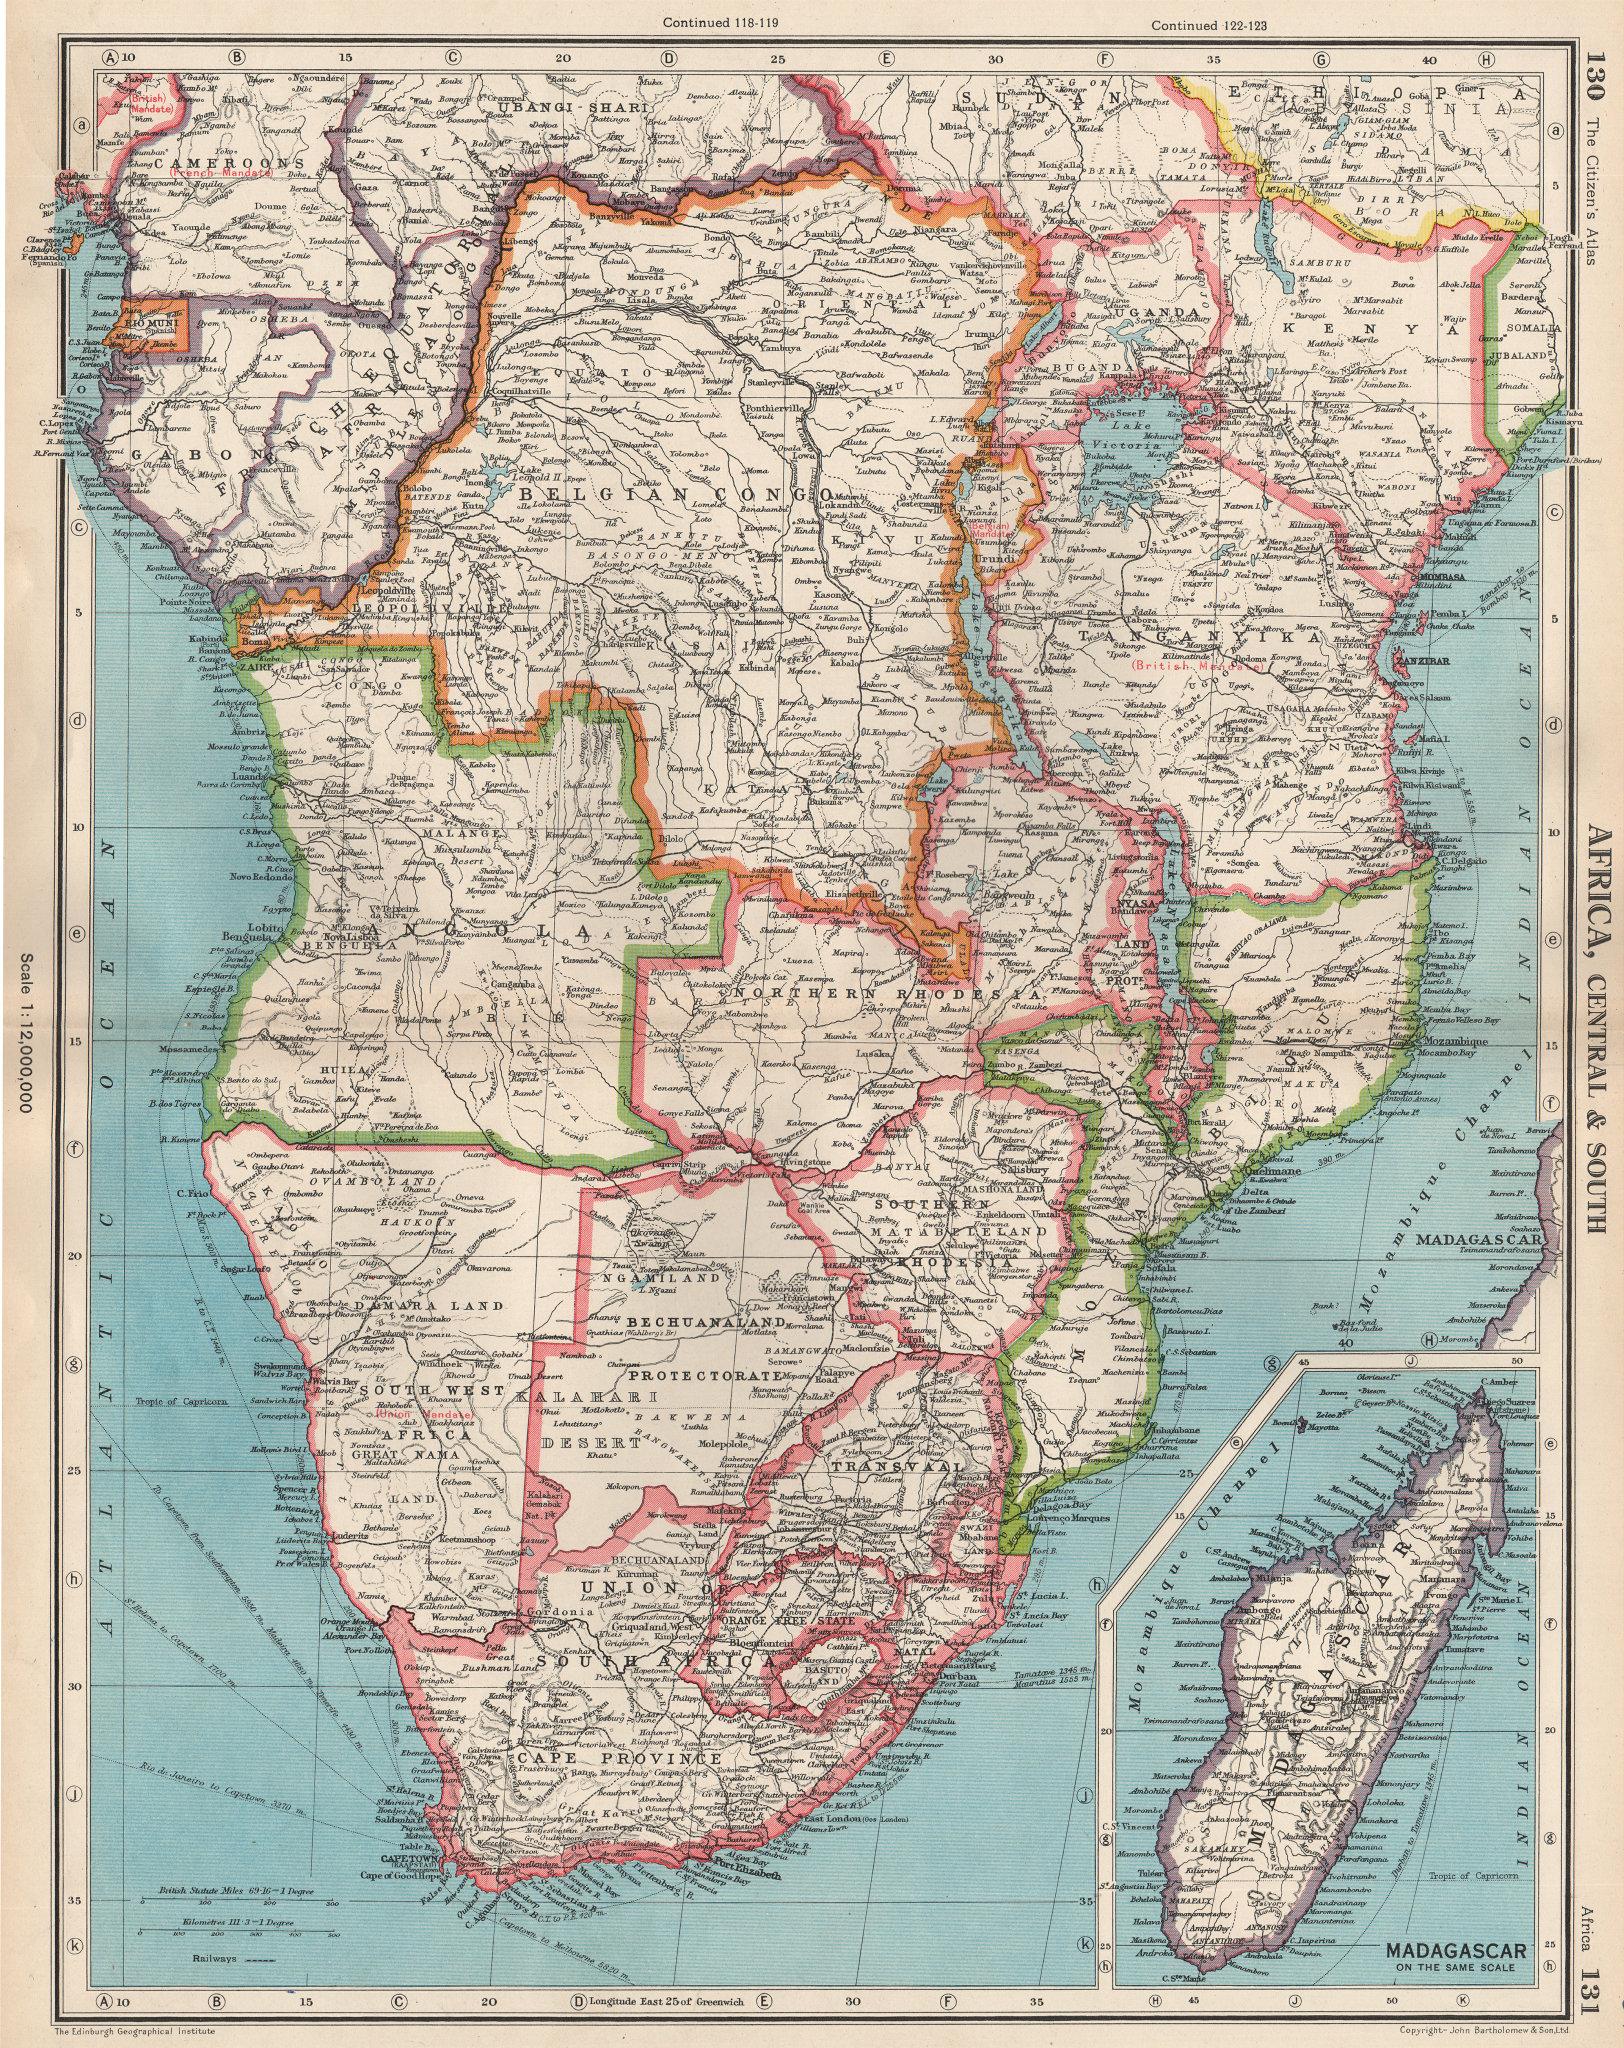 Associate Product SOUTHERN AFRICA. Belgian Congo Rhodesia Bechuanaland Tangyanika 1952 old map